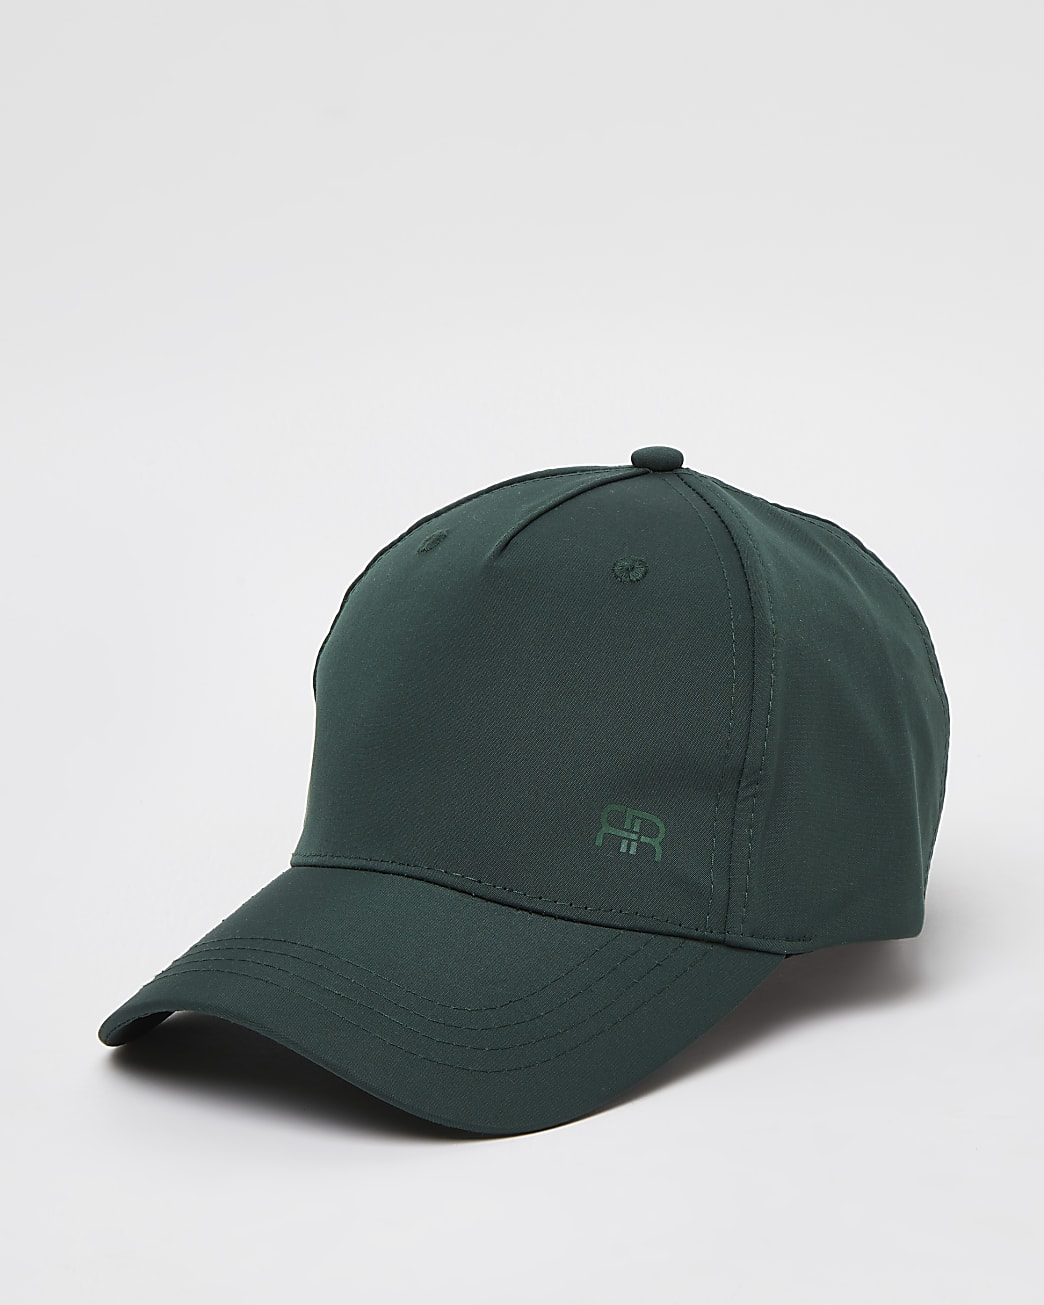 Green RI branded cap